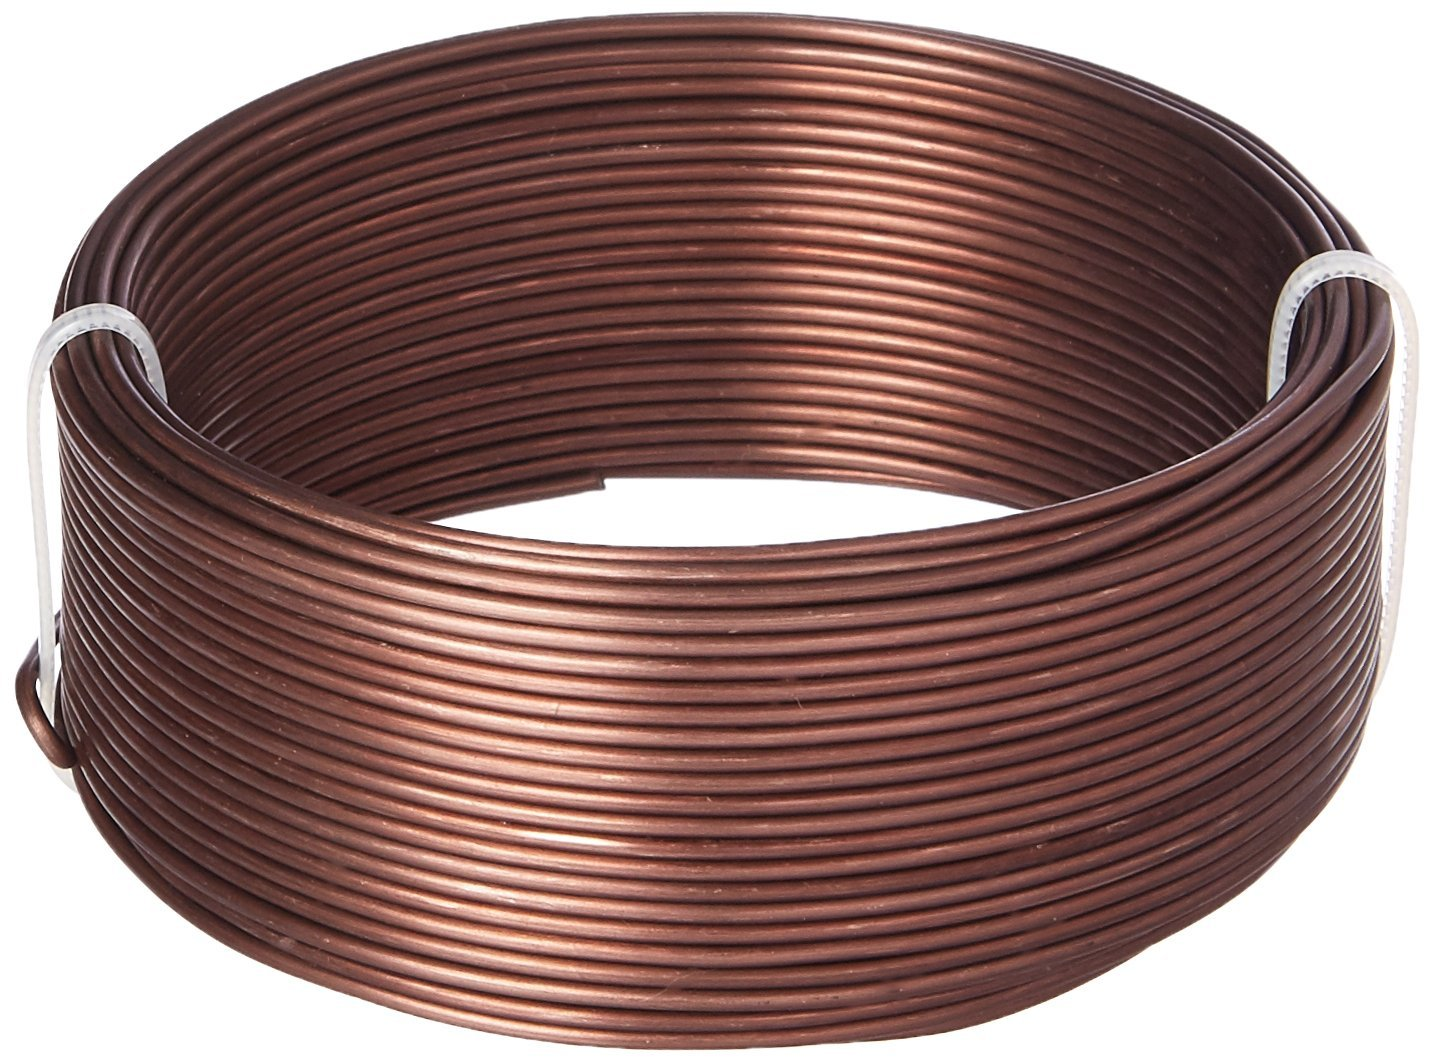 Sensational Amazon Com Dallas Bonsai Copper Colored Aluminum Wire 1 5 Mm 100 G Wiring Cloud Usnesfoxcilixyz